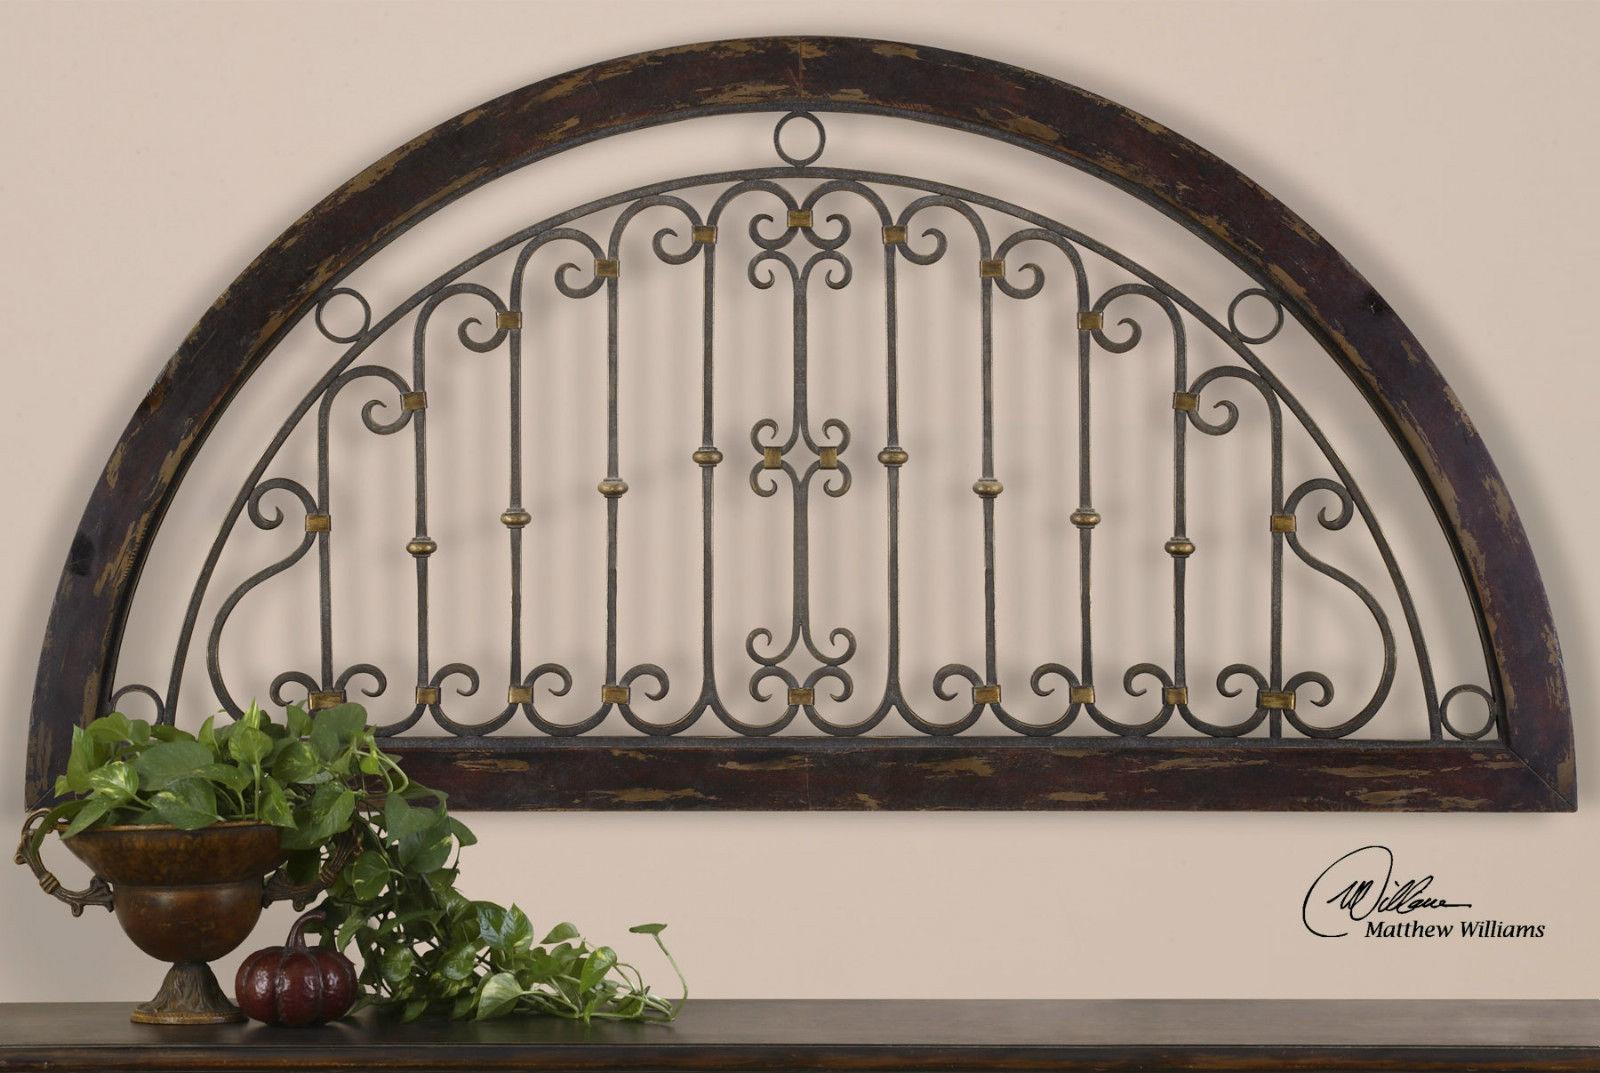 Compact Design Decor Wall Art Rustic Wood Rustic Wrought Iron Wall Inside Wood And Iron Wall Art (Image 5 of 20)